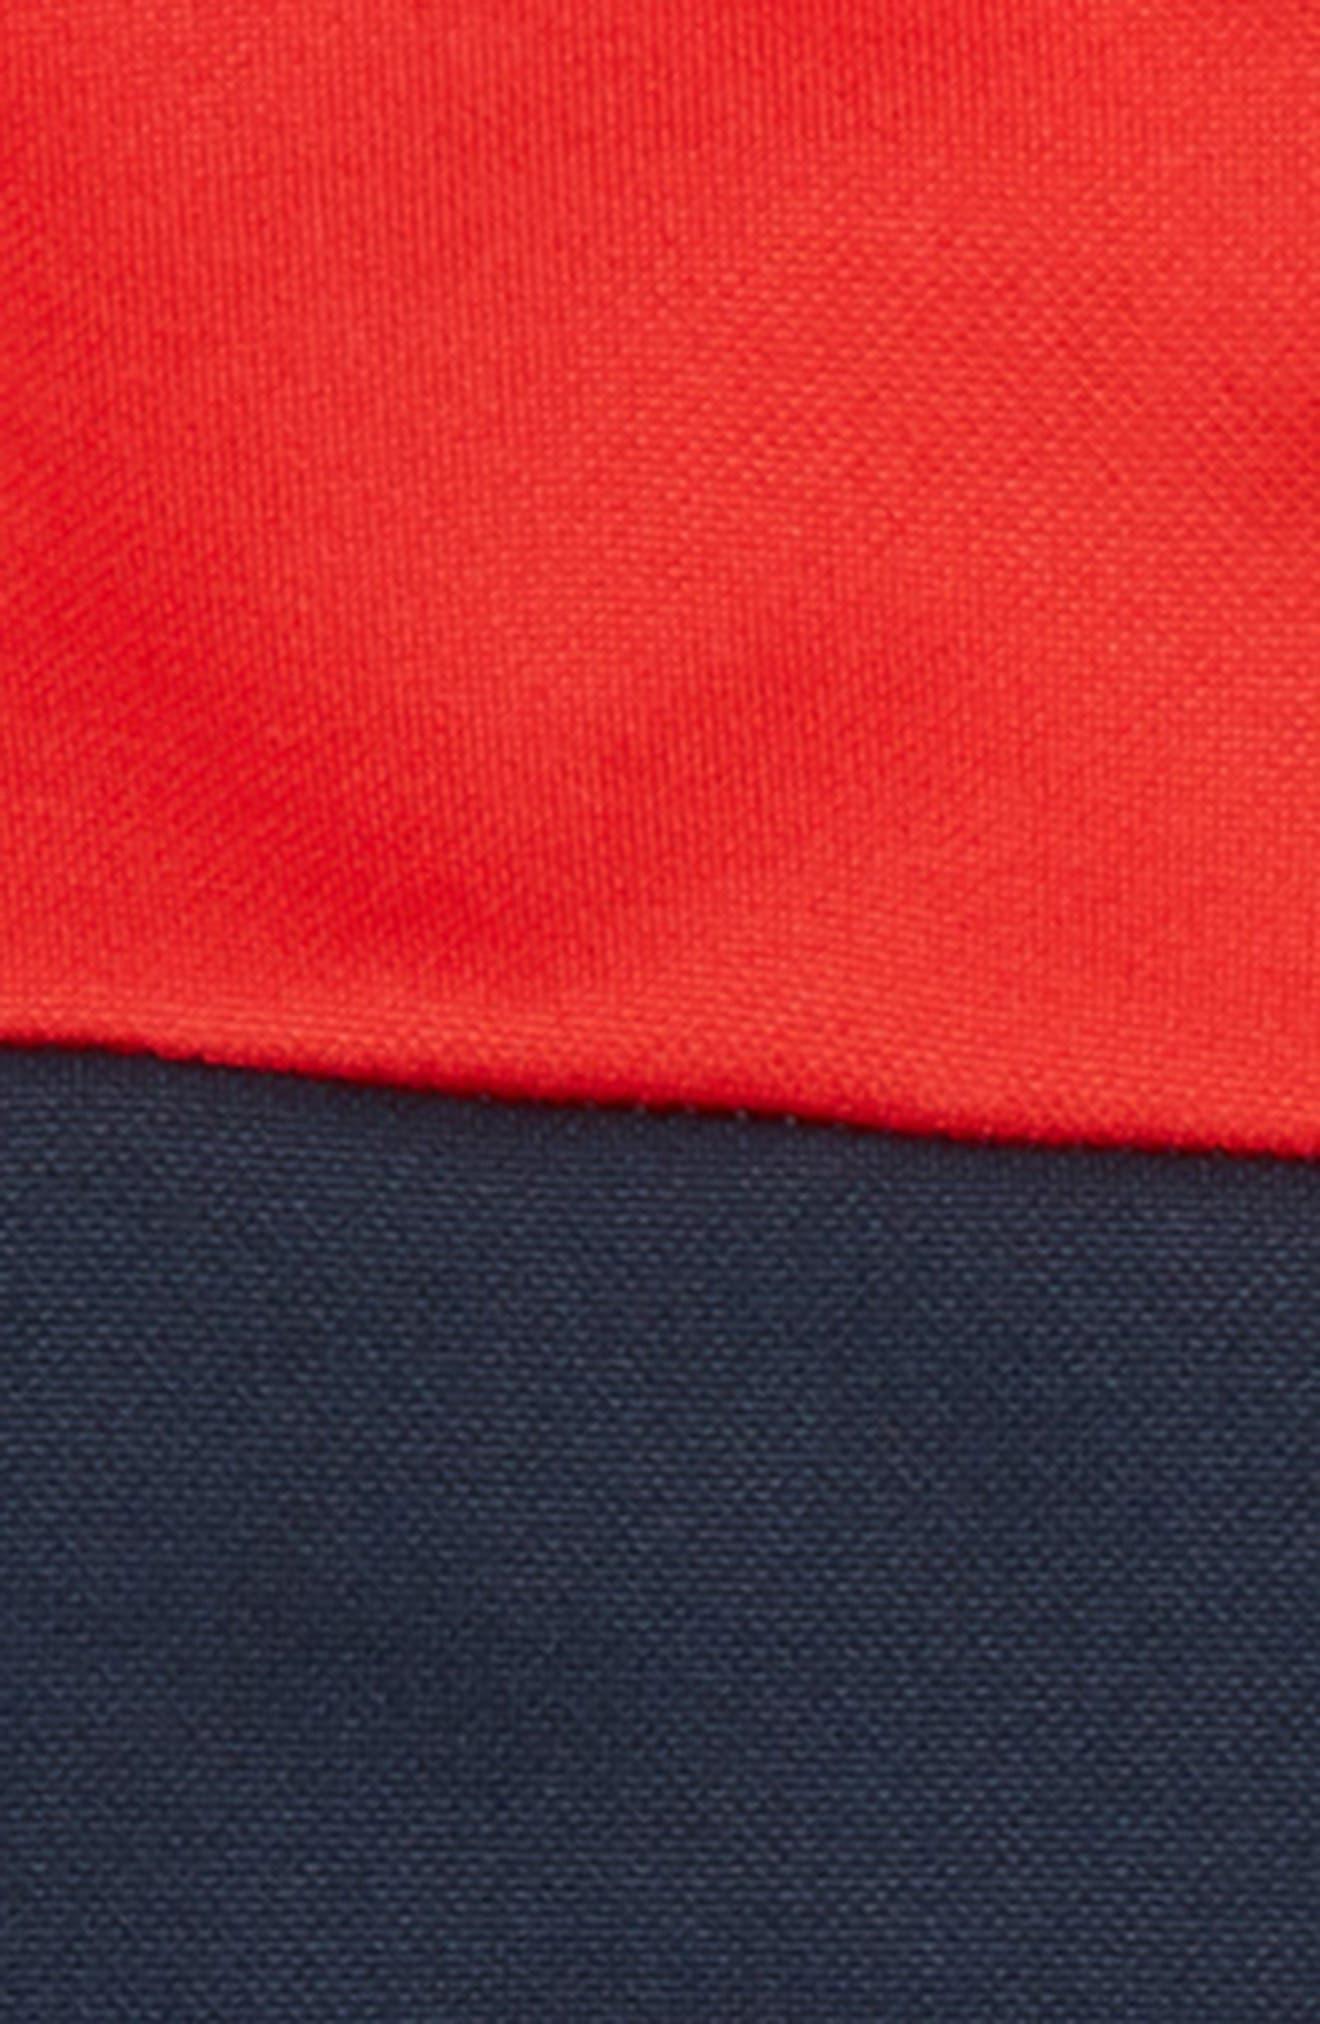 Therma Full Zip Hoodie & Sweatpants Set,                             Alternate thumbnail 2, color,                             OBSIDIAN